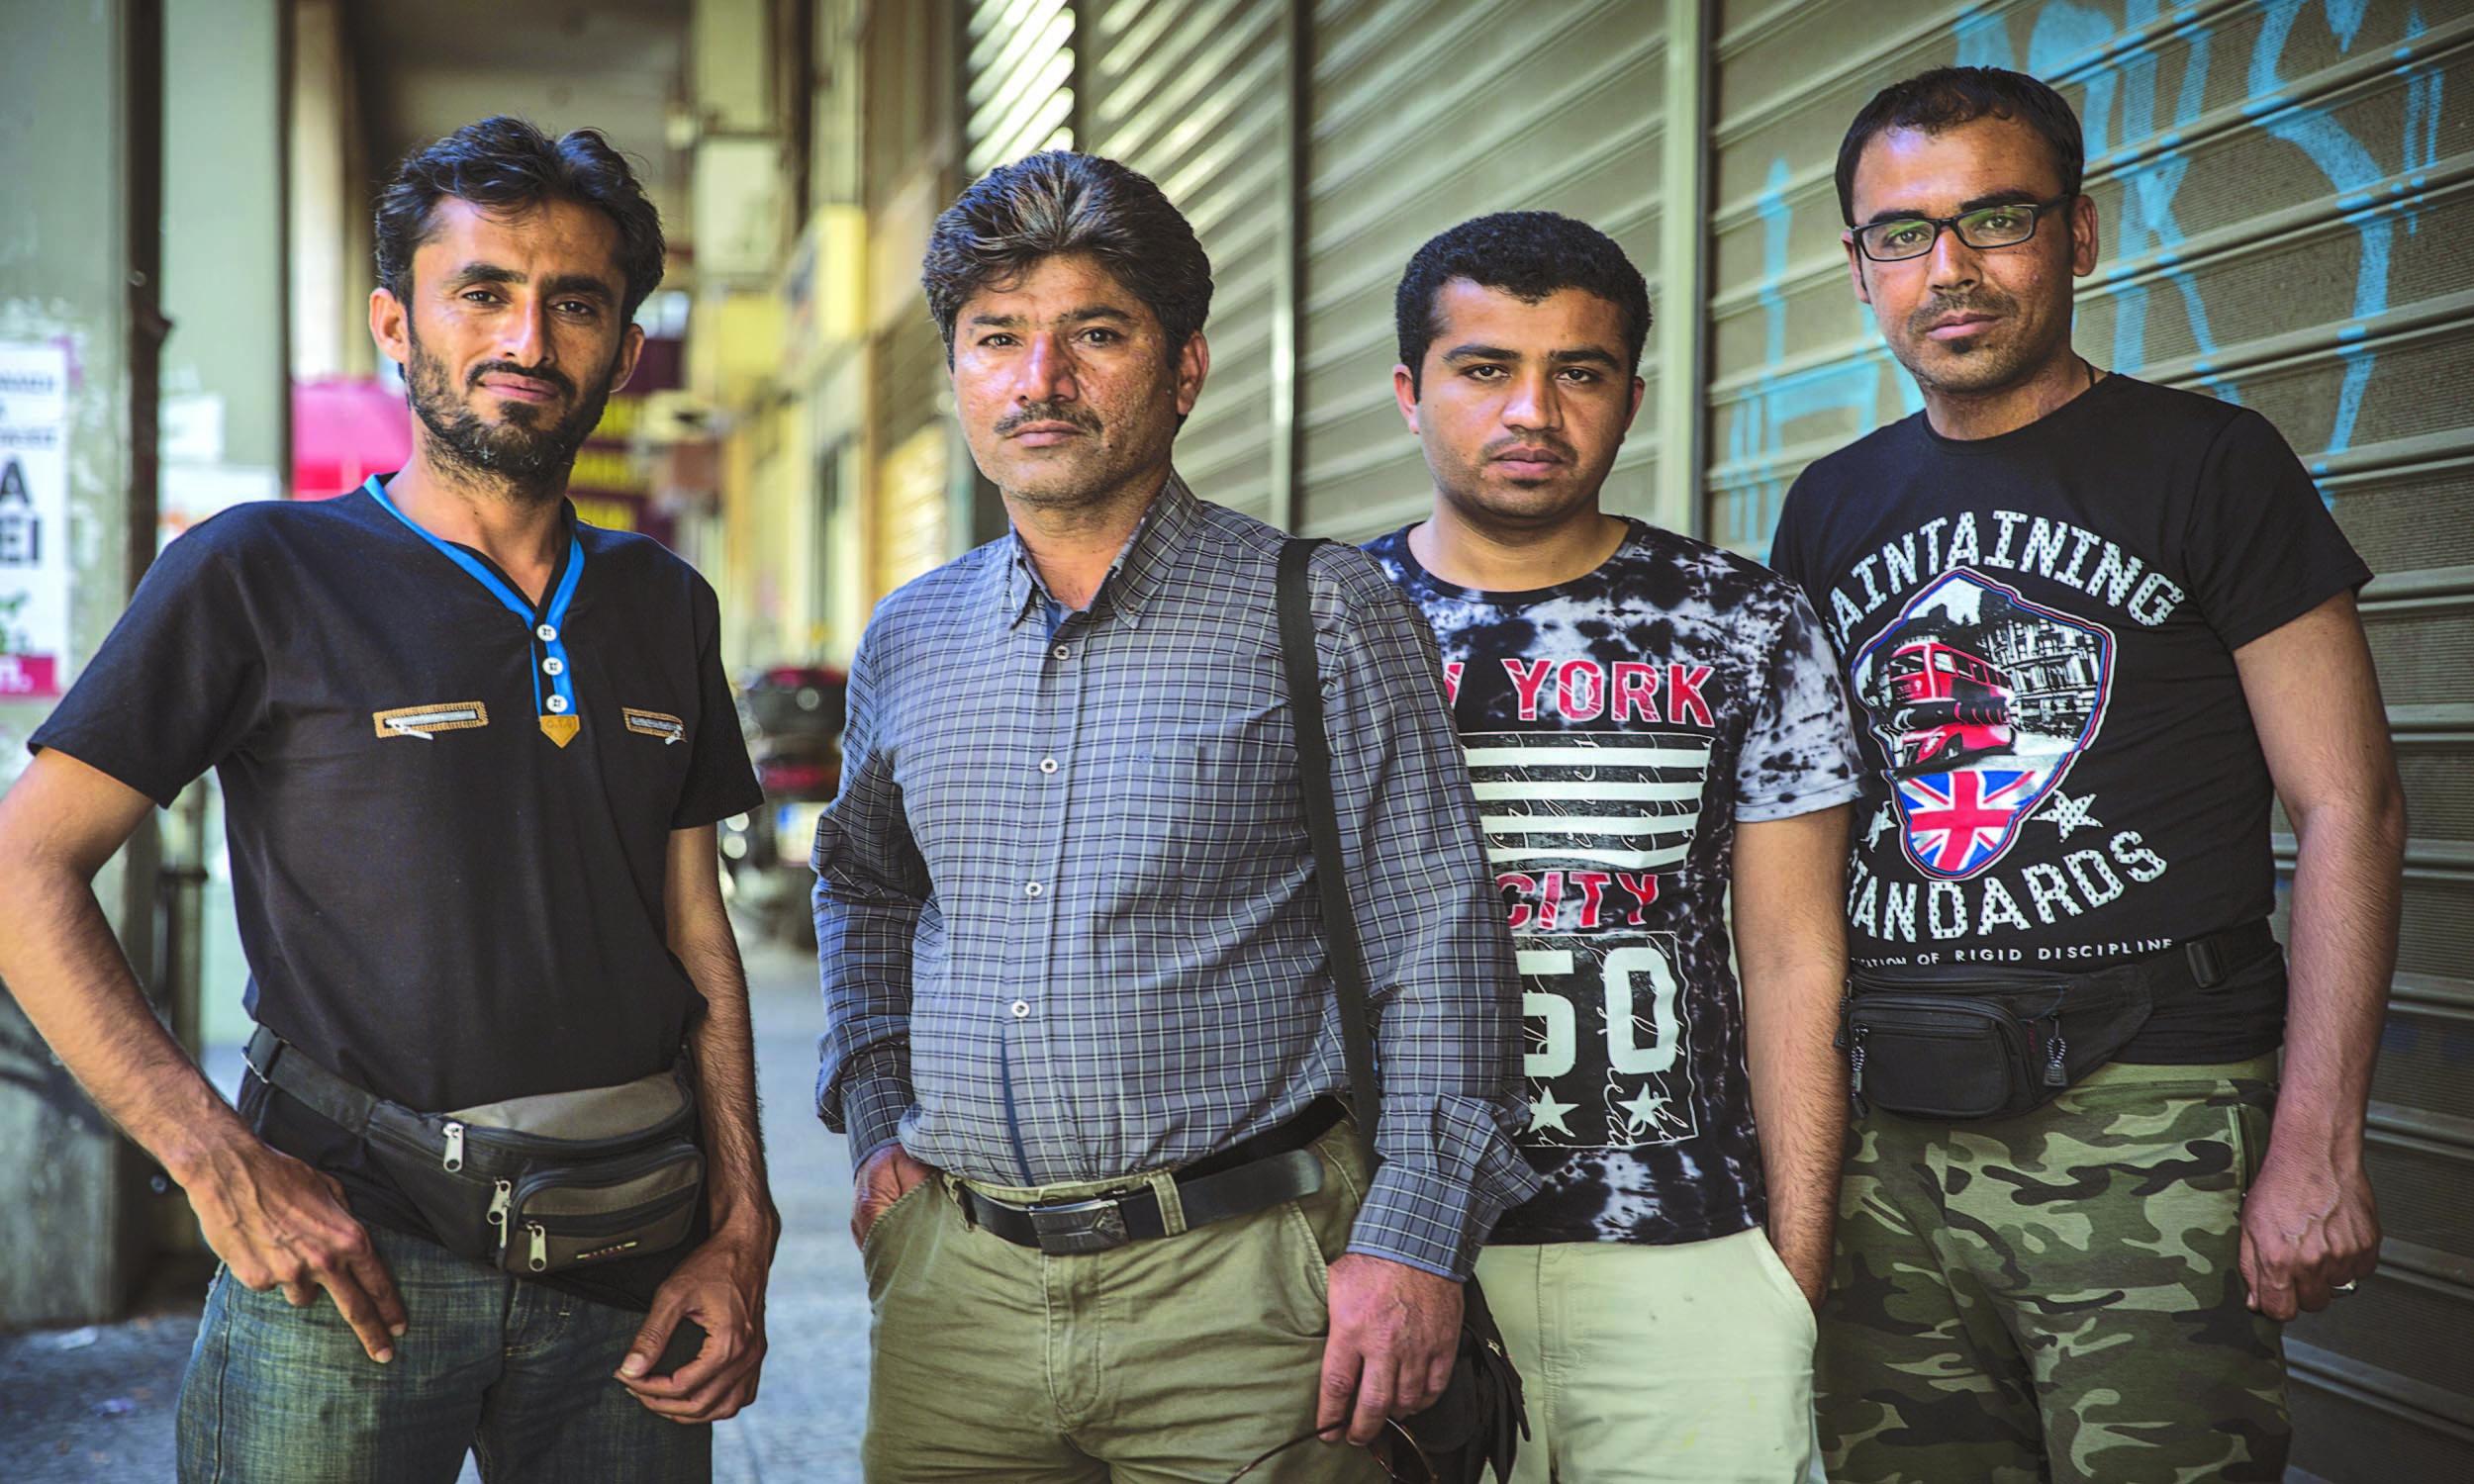 Baloch migrants in Athens | Jodi Hilton